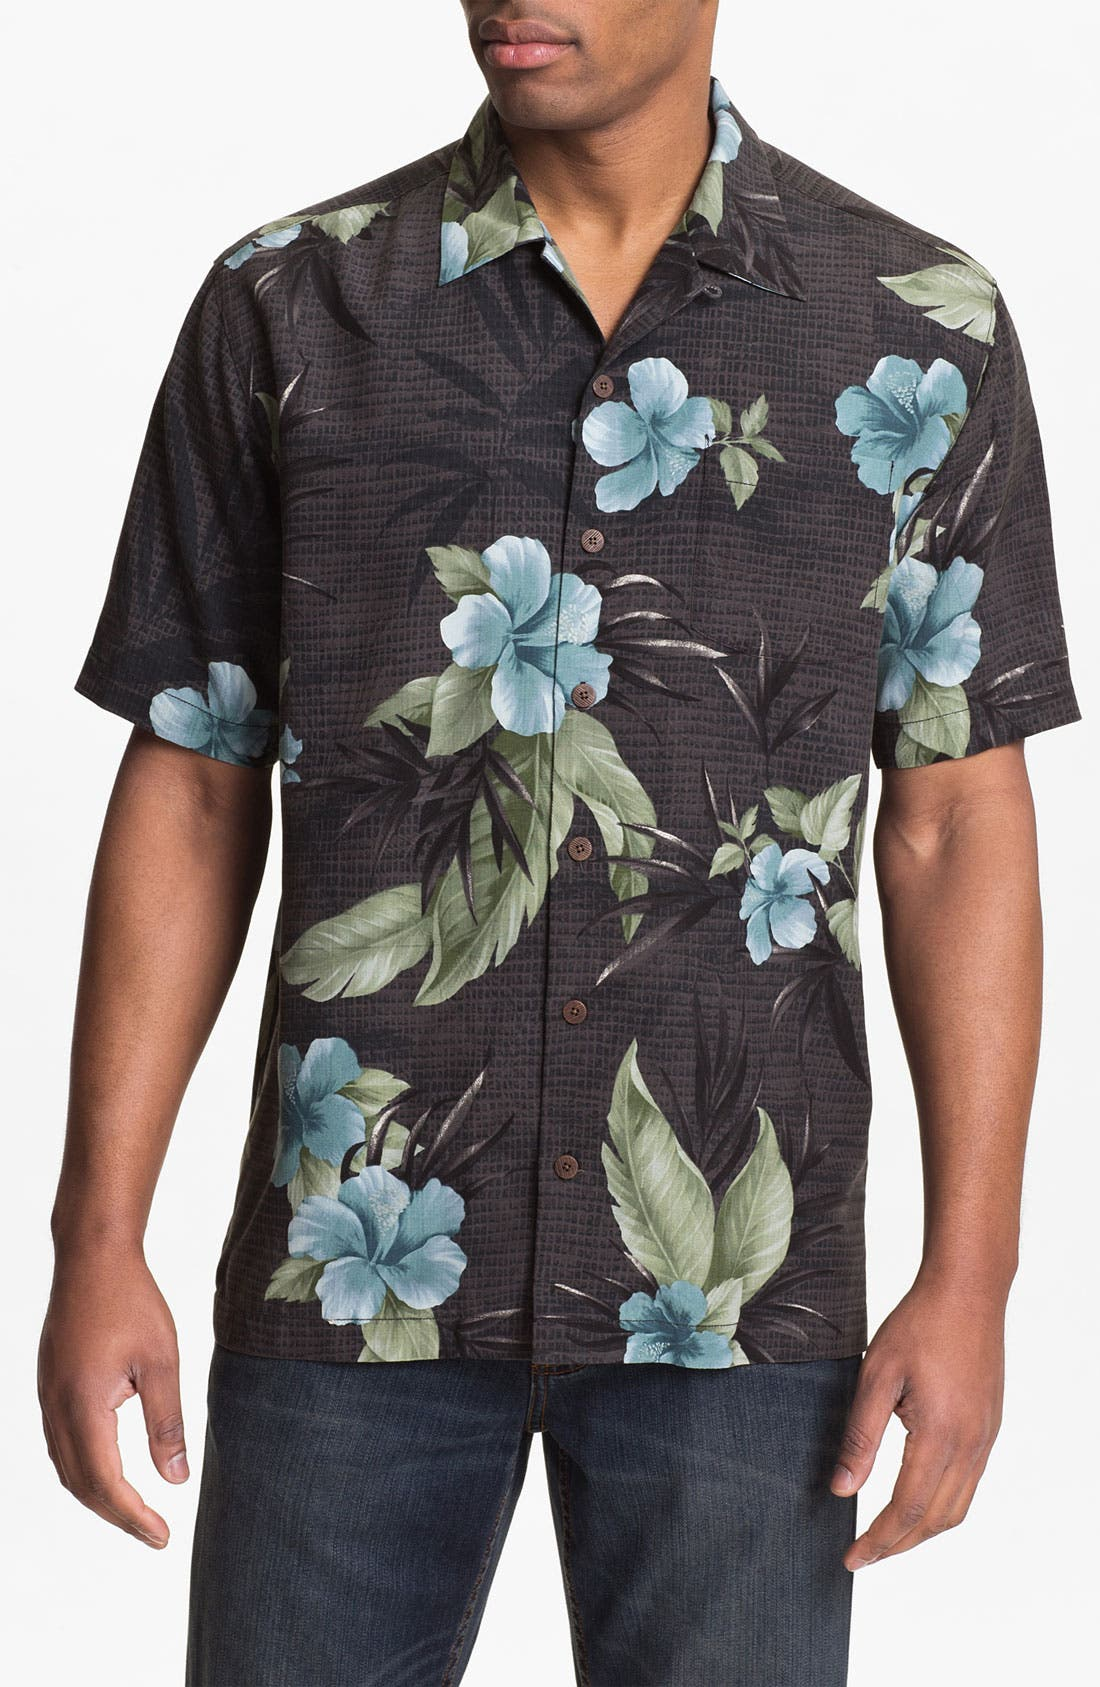 Alternate Image 1 Selected - Tommy Bahama 'Tropical Mosaic' Silk Campshirt (Big & Tall)